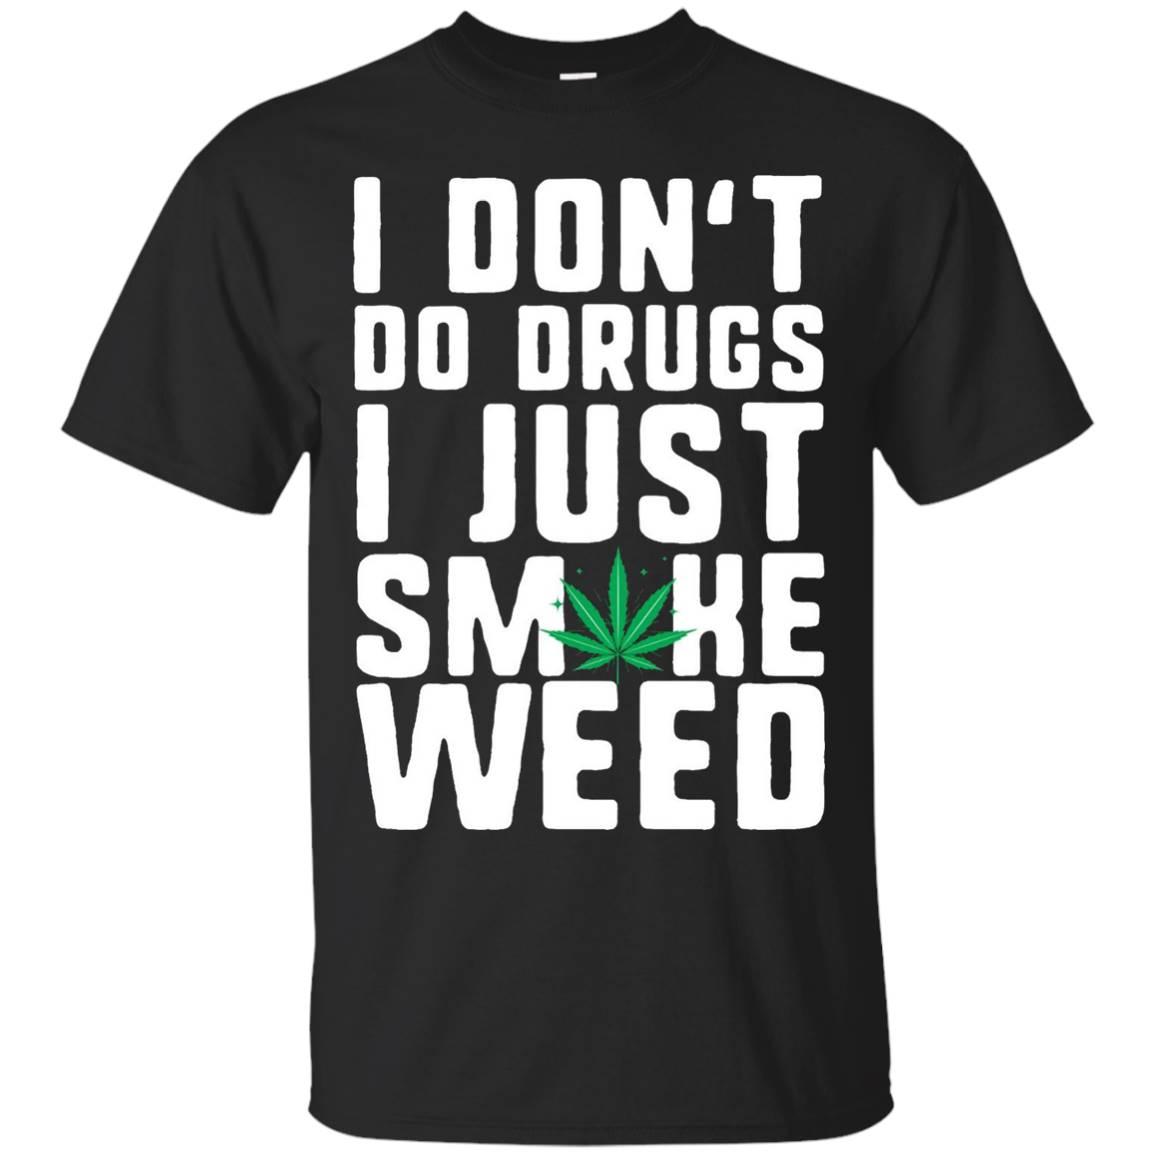 I Don't Do Drugs I Just Smoke Weed T-Shirt